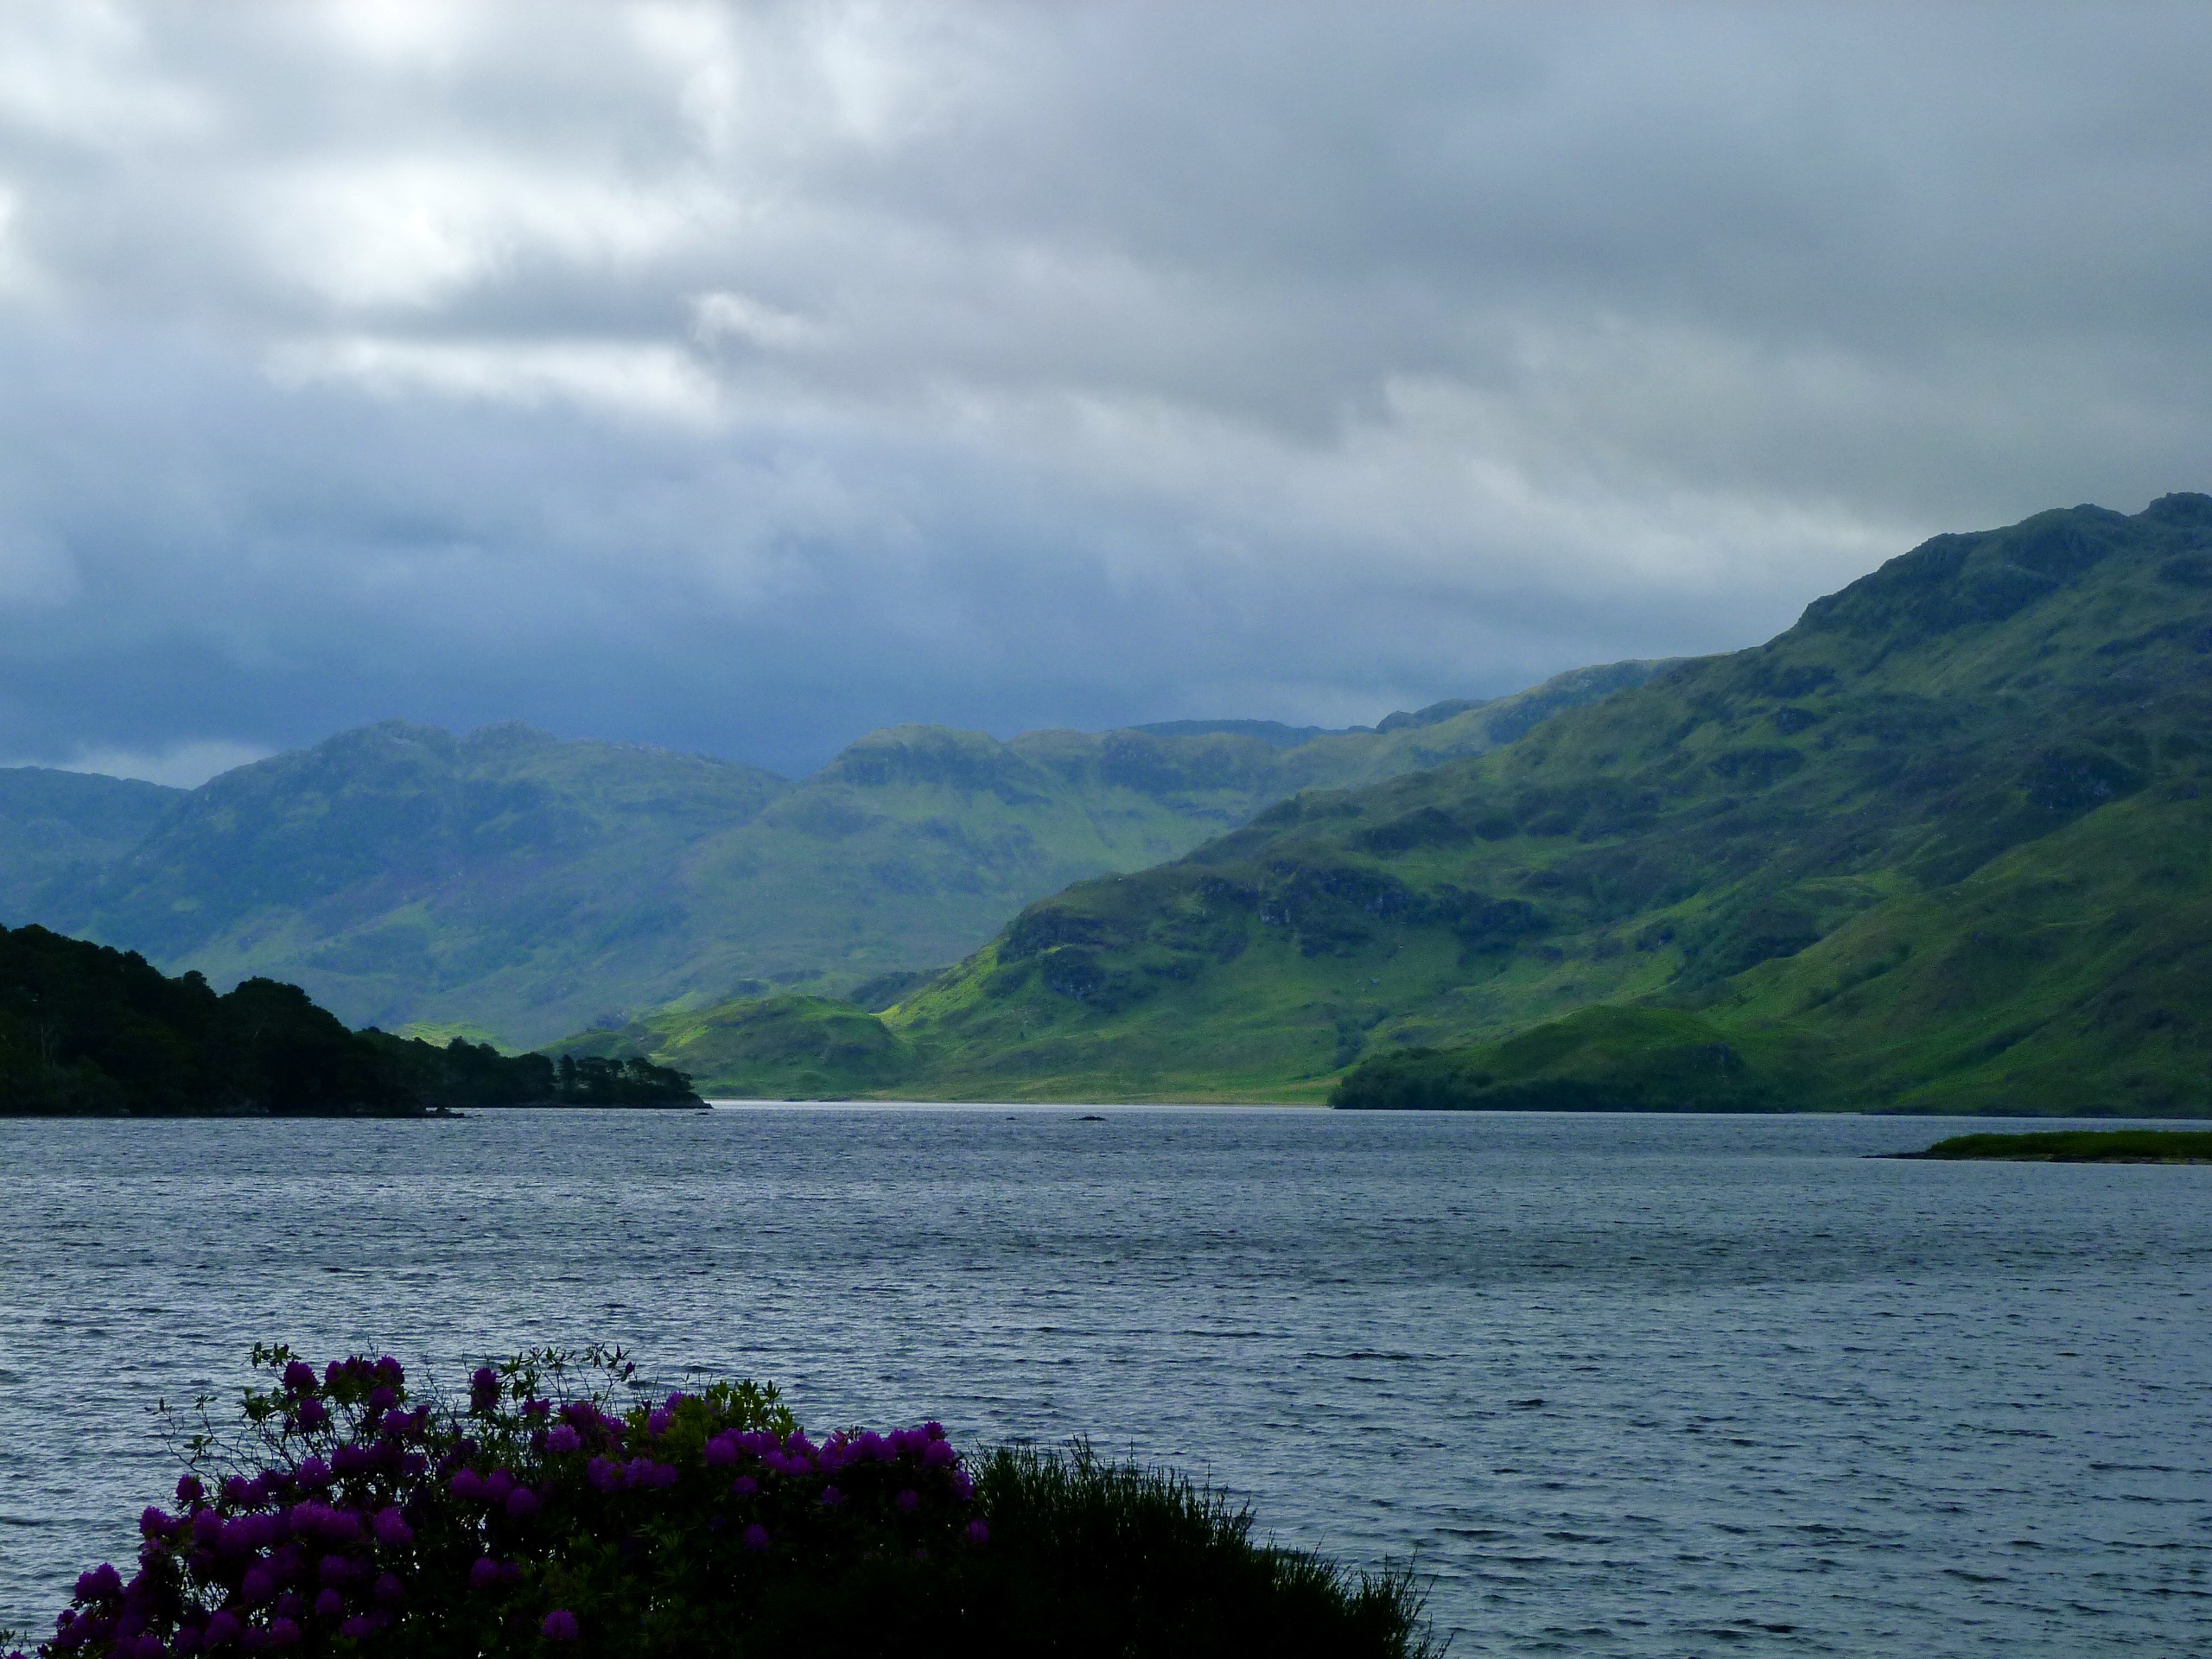 view of Loch Morar from St Cumin's church